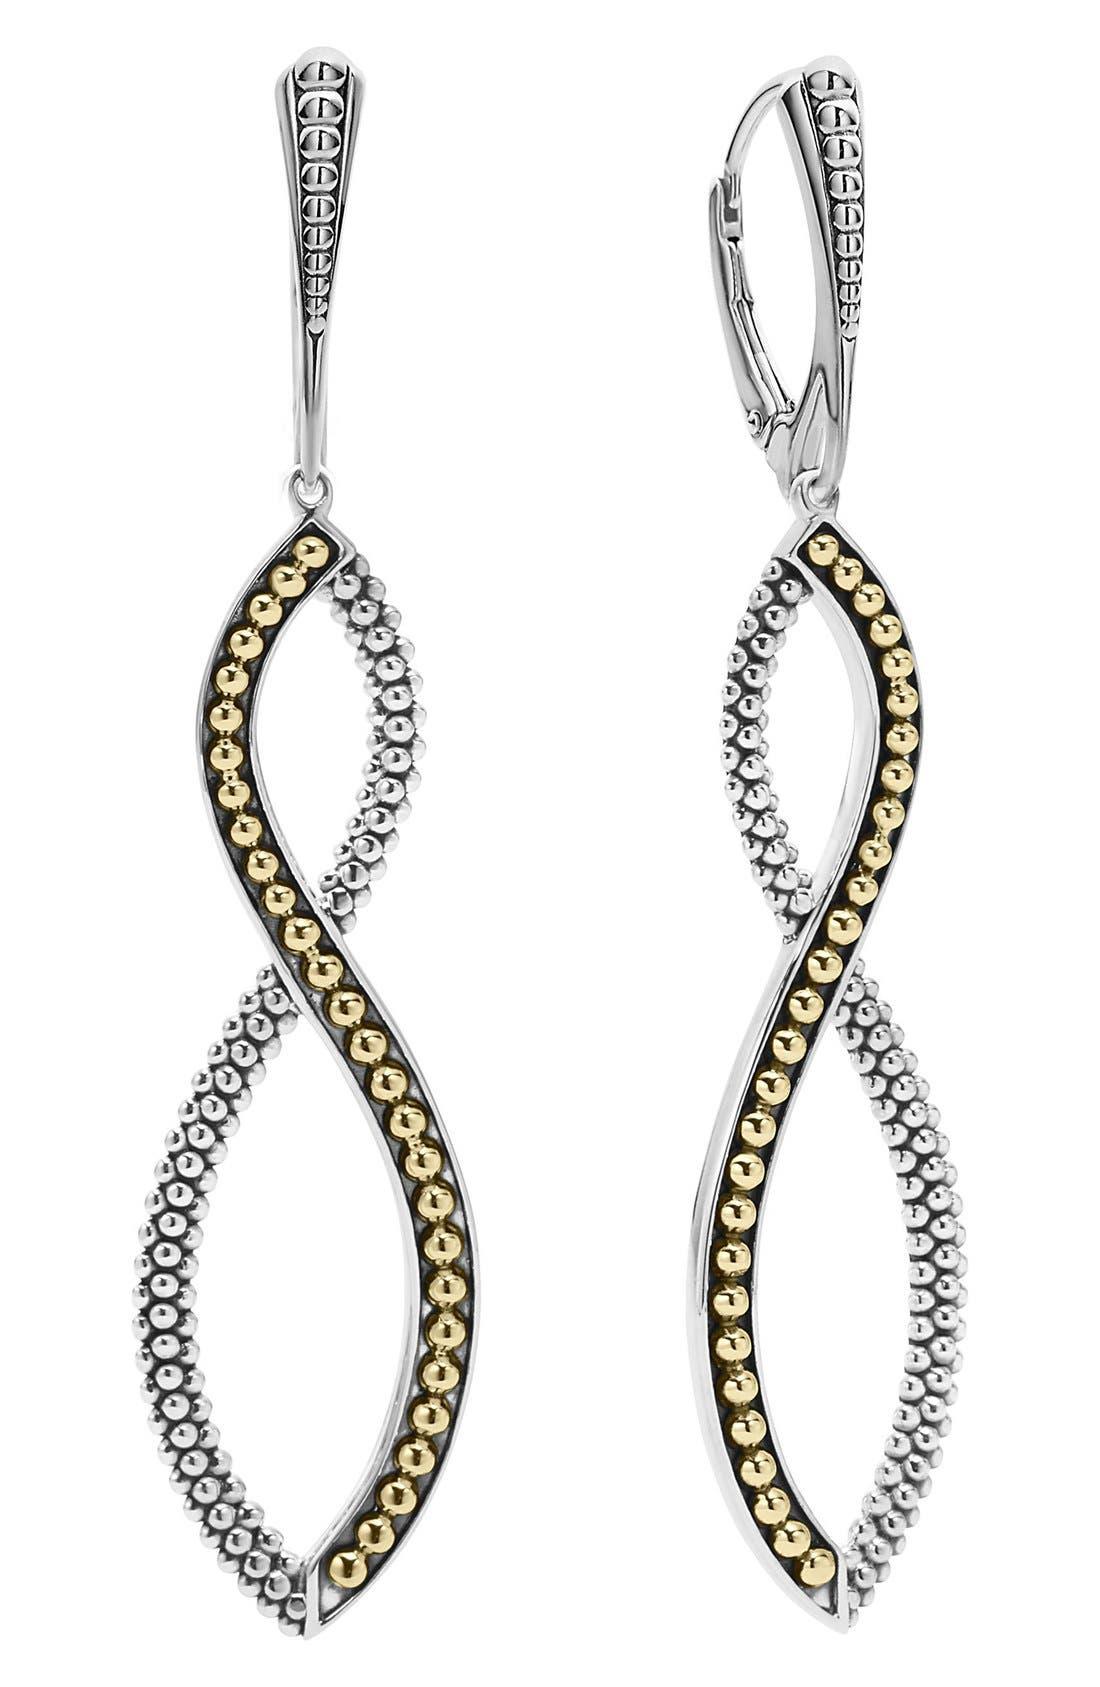 Infinity Twist Drop Earrings,                             Alternate thumbnail 2, color,                             Silver/ Gold